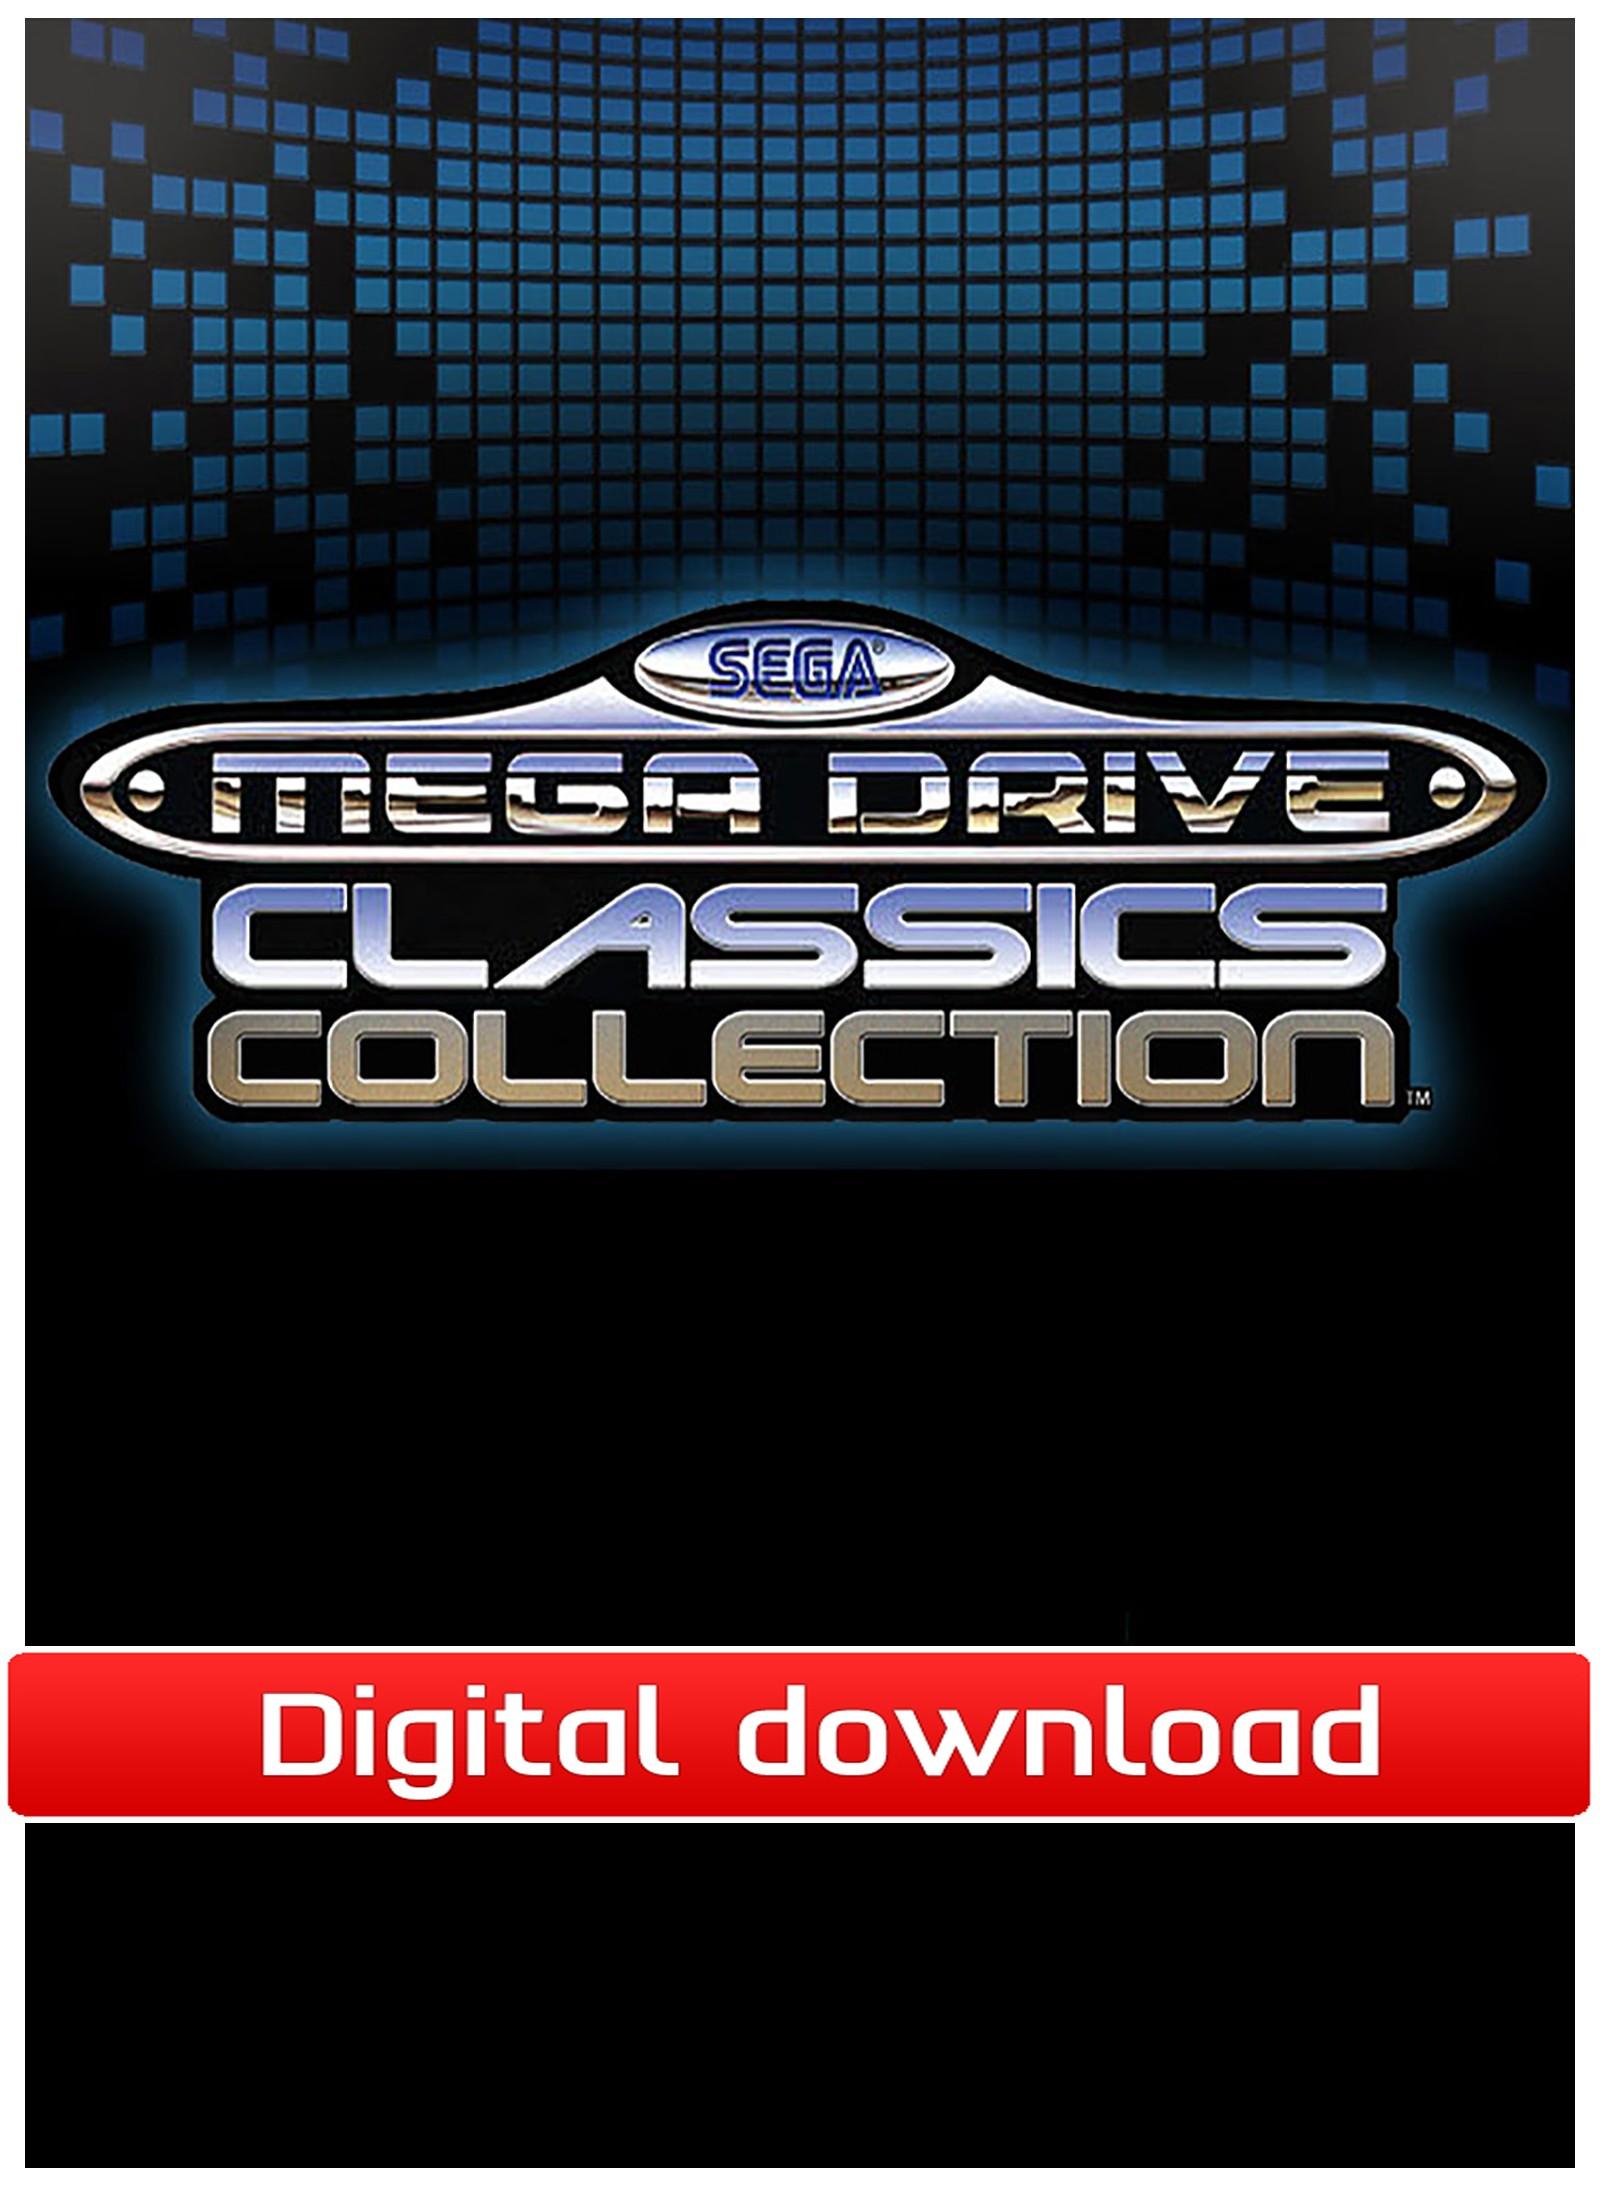 SEGA Classics Collection (PC nedlastning) PCDD31588